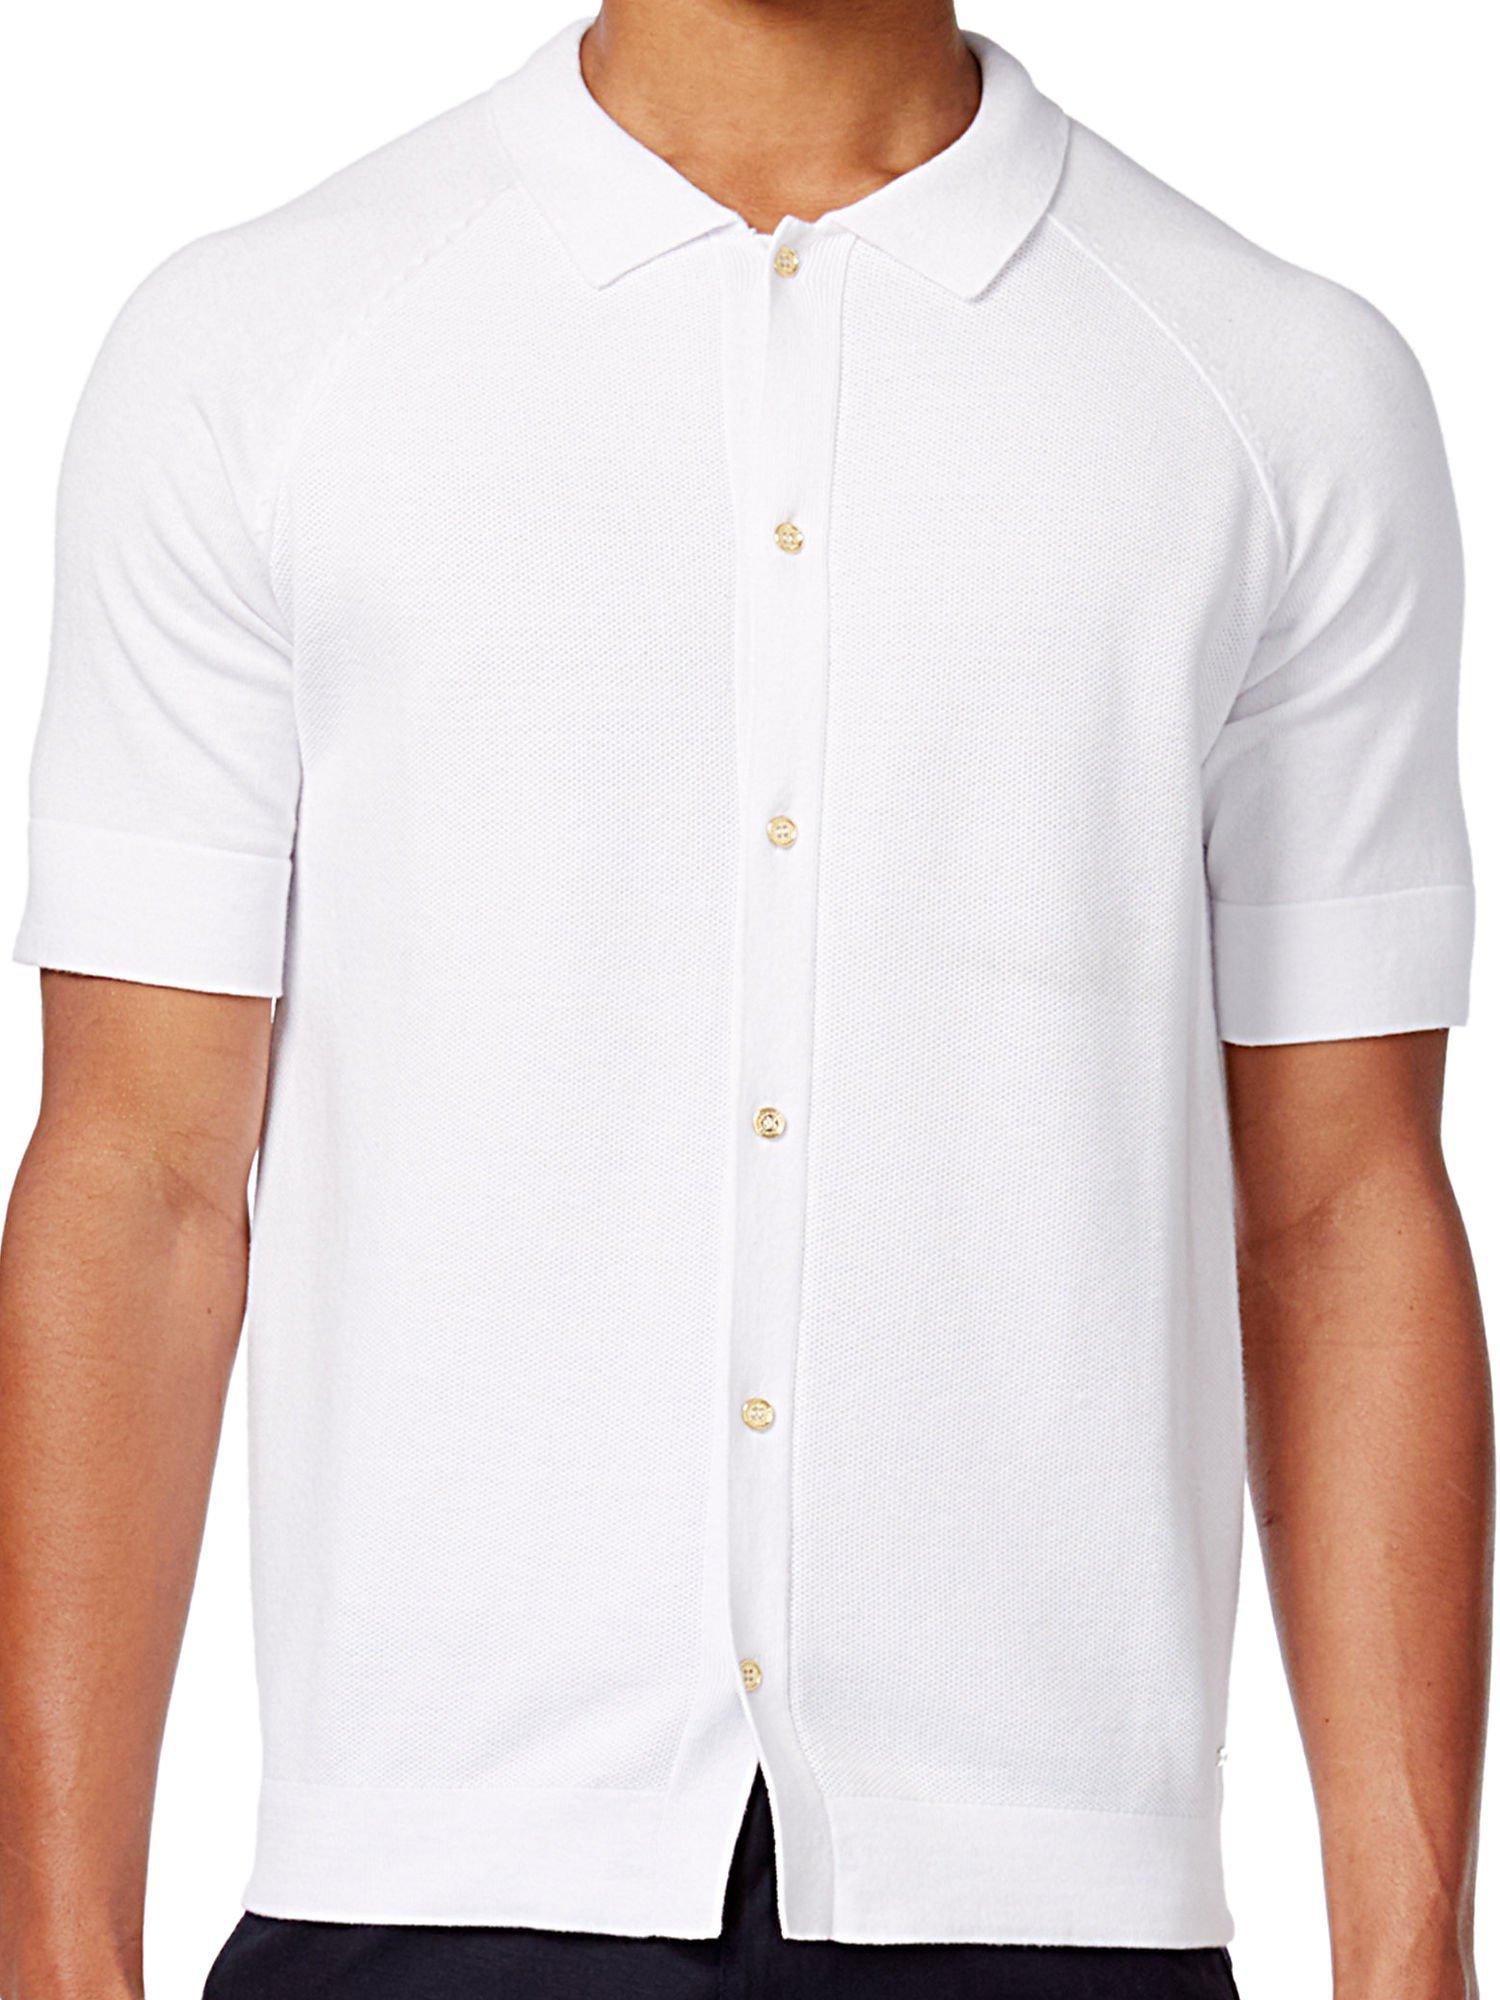 Sean John Mens Short-Sleeve Button-Front Cotton Sweater Bright White 2XL by Sean John